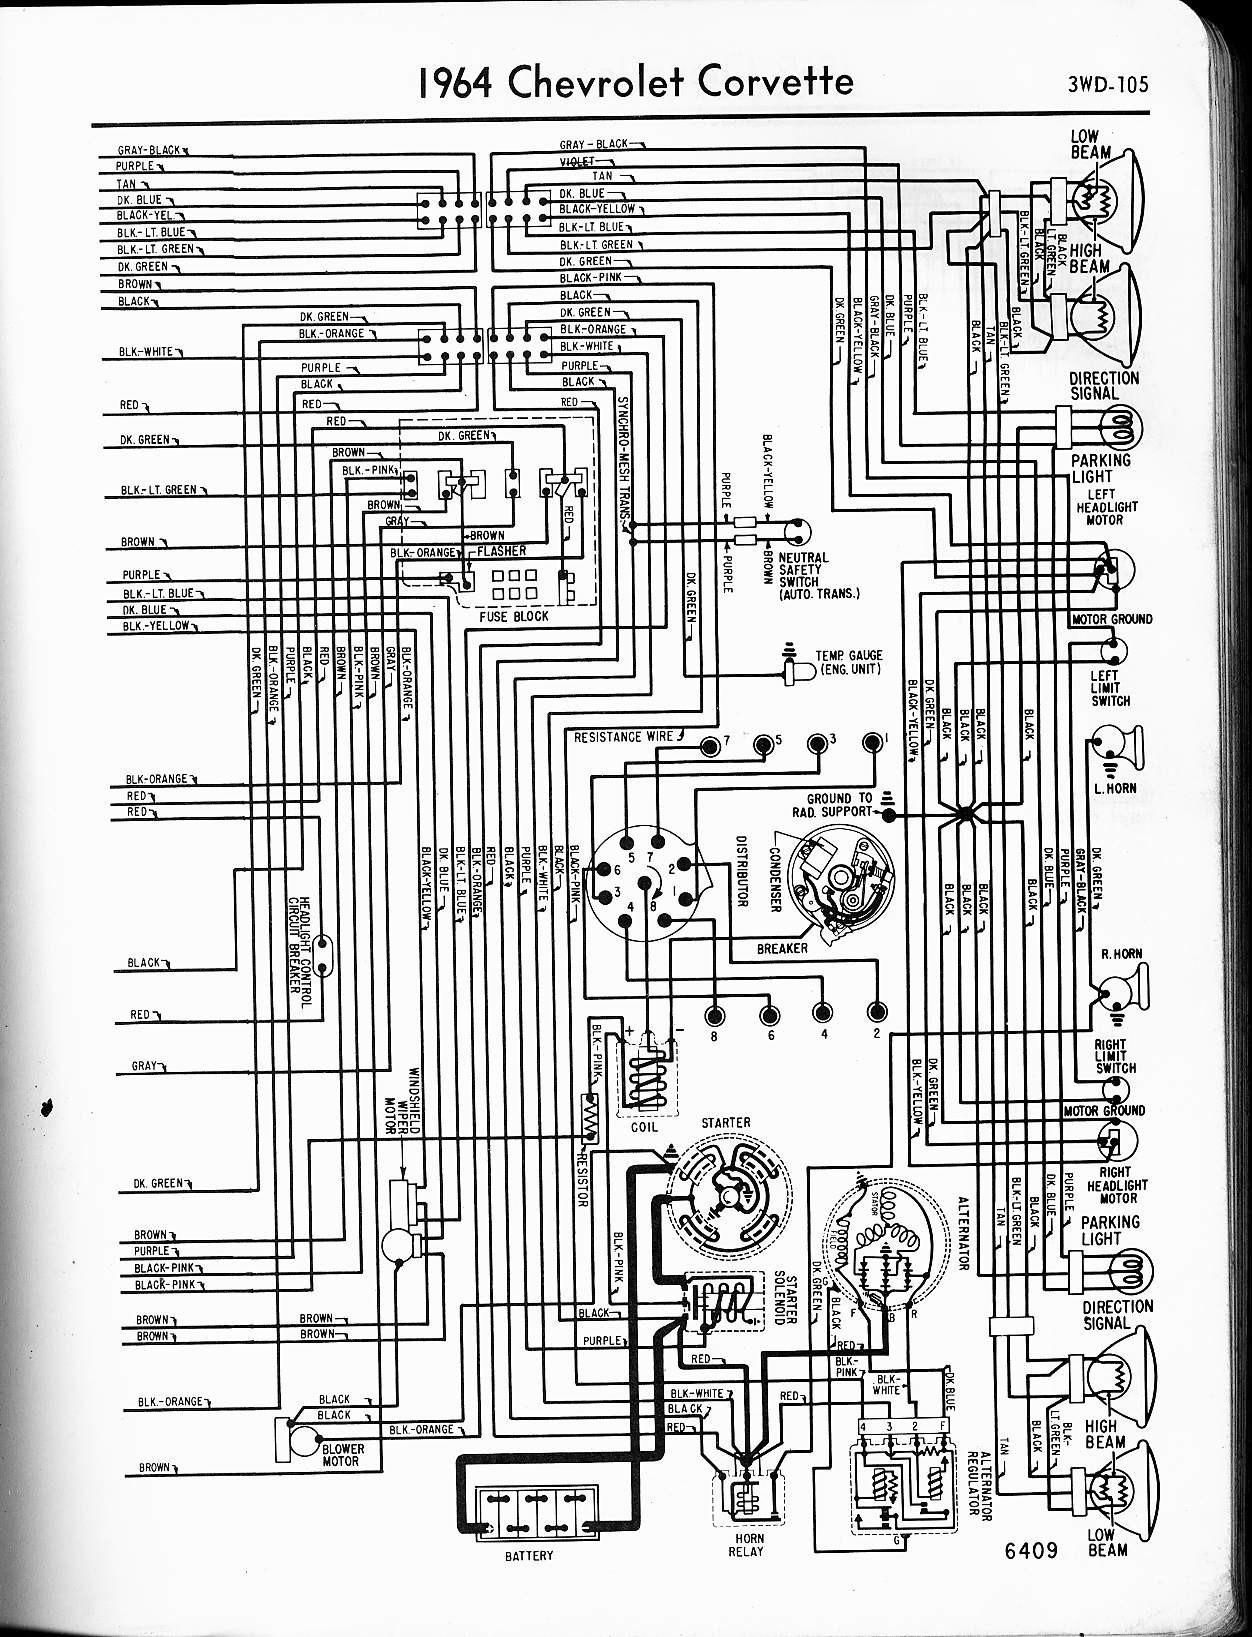 BY_2823] Amp Wiring Diagram For Optimus Free DiagramOver Epete Elae Jebrp Mohammedshrine Librar Wiring 101